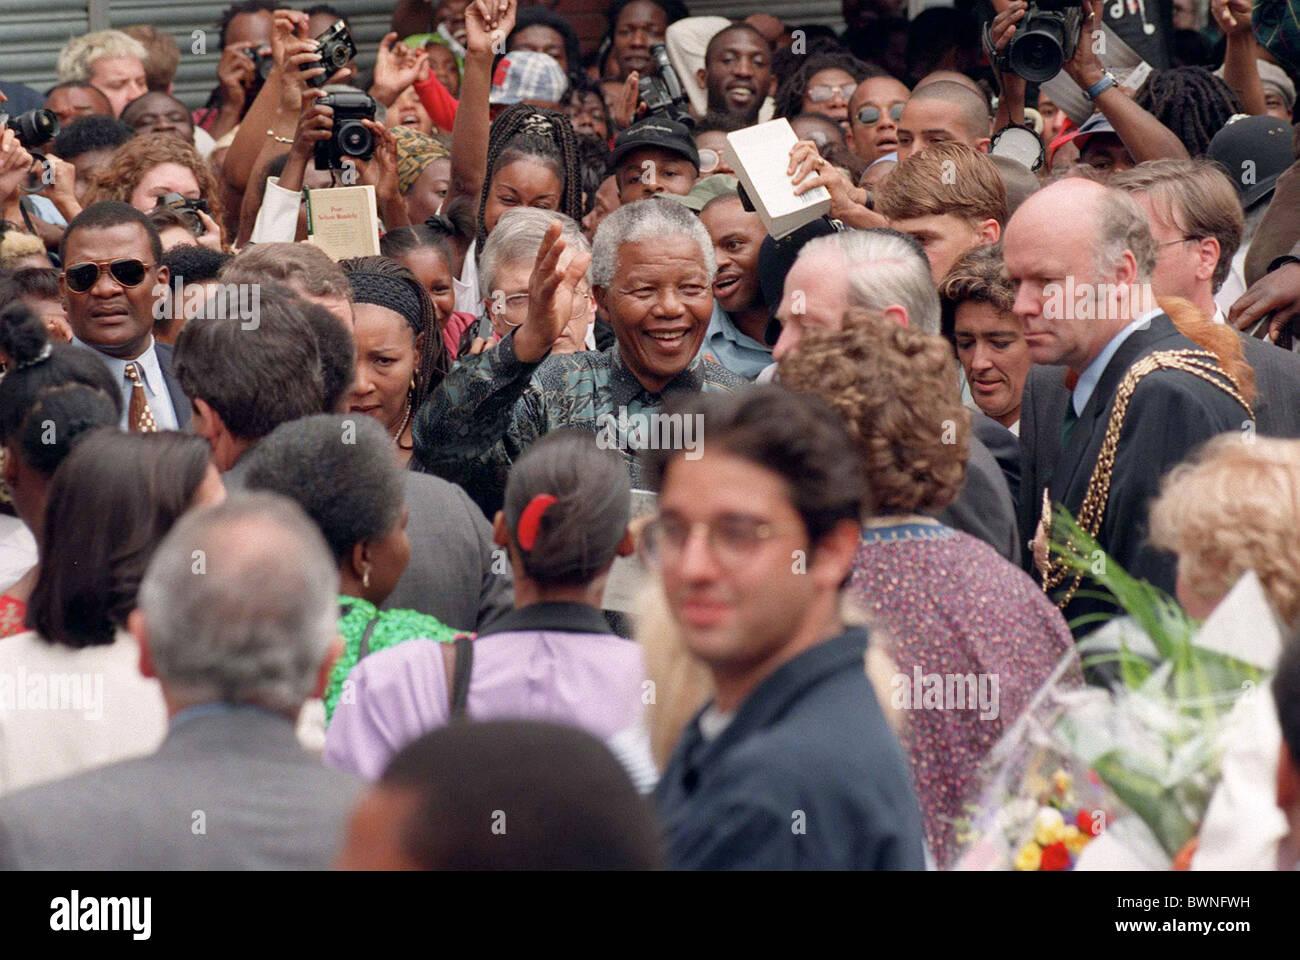 PRESIDENT NELSON MANDELA IN BRIXTON MARKET LONDON - Stock Image